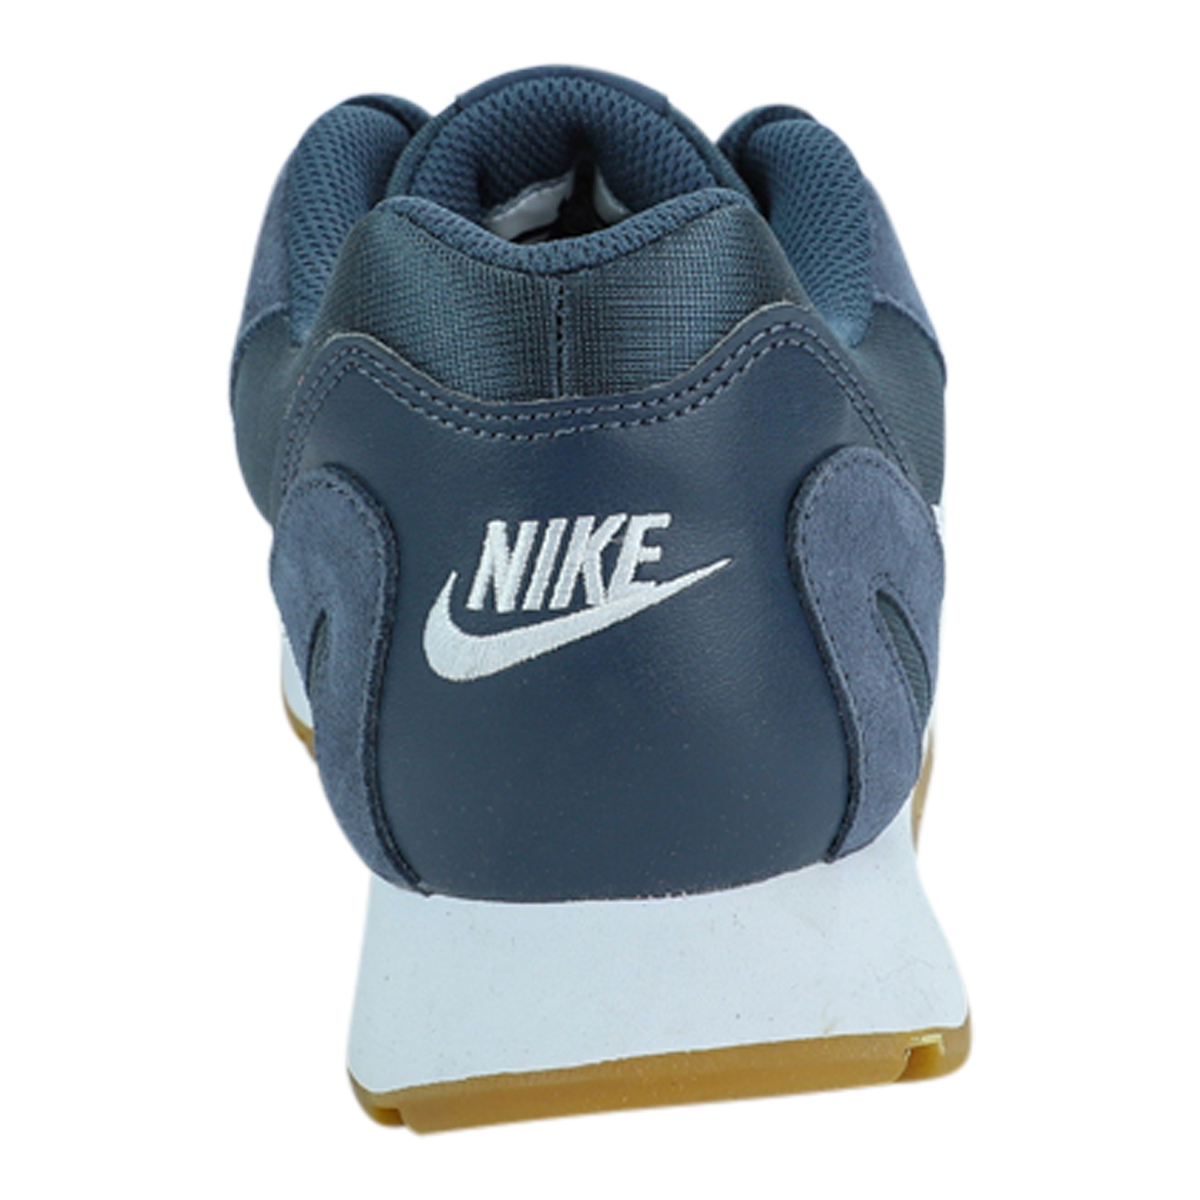 Nike-Men-039-s-Delfine-Running-Shoes thumbnail 16